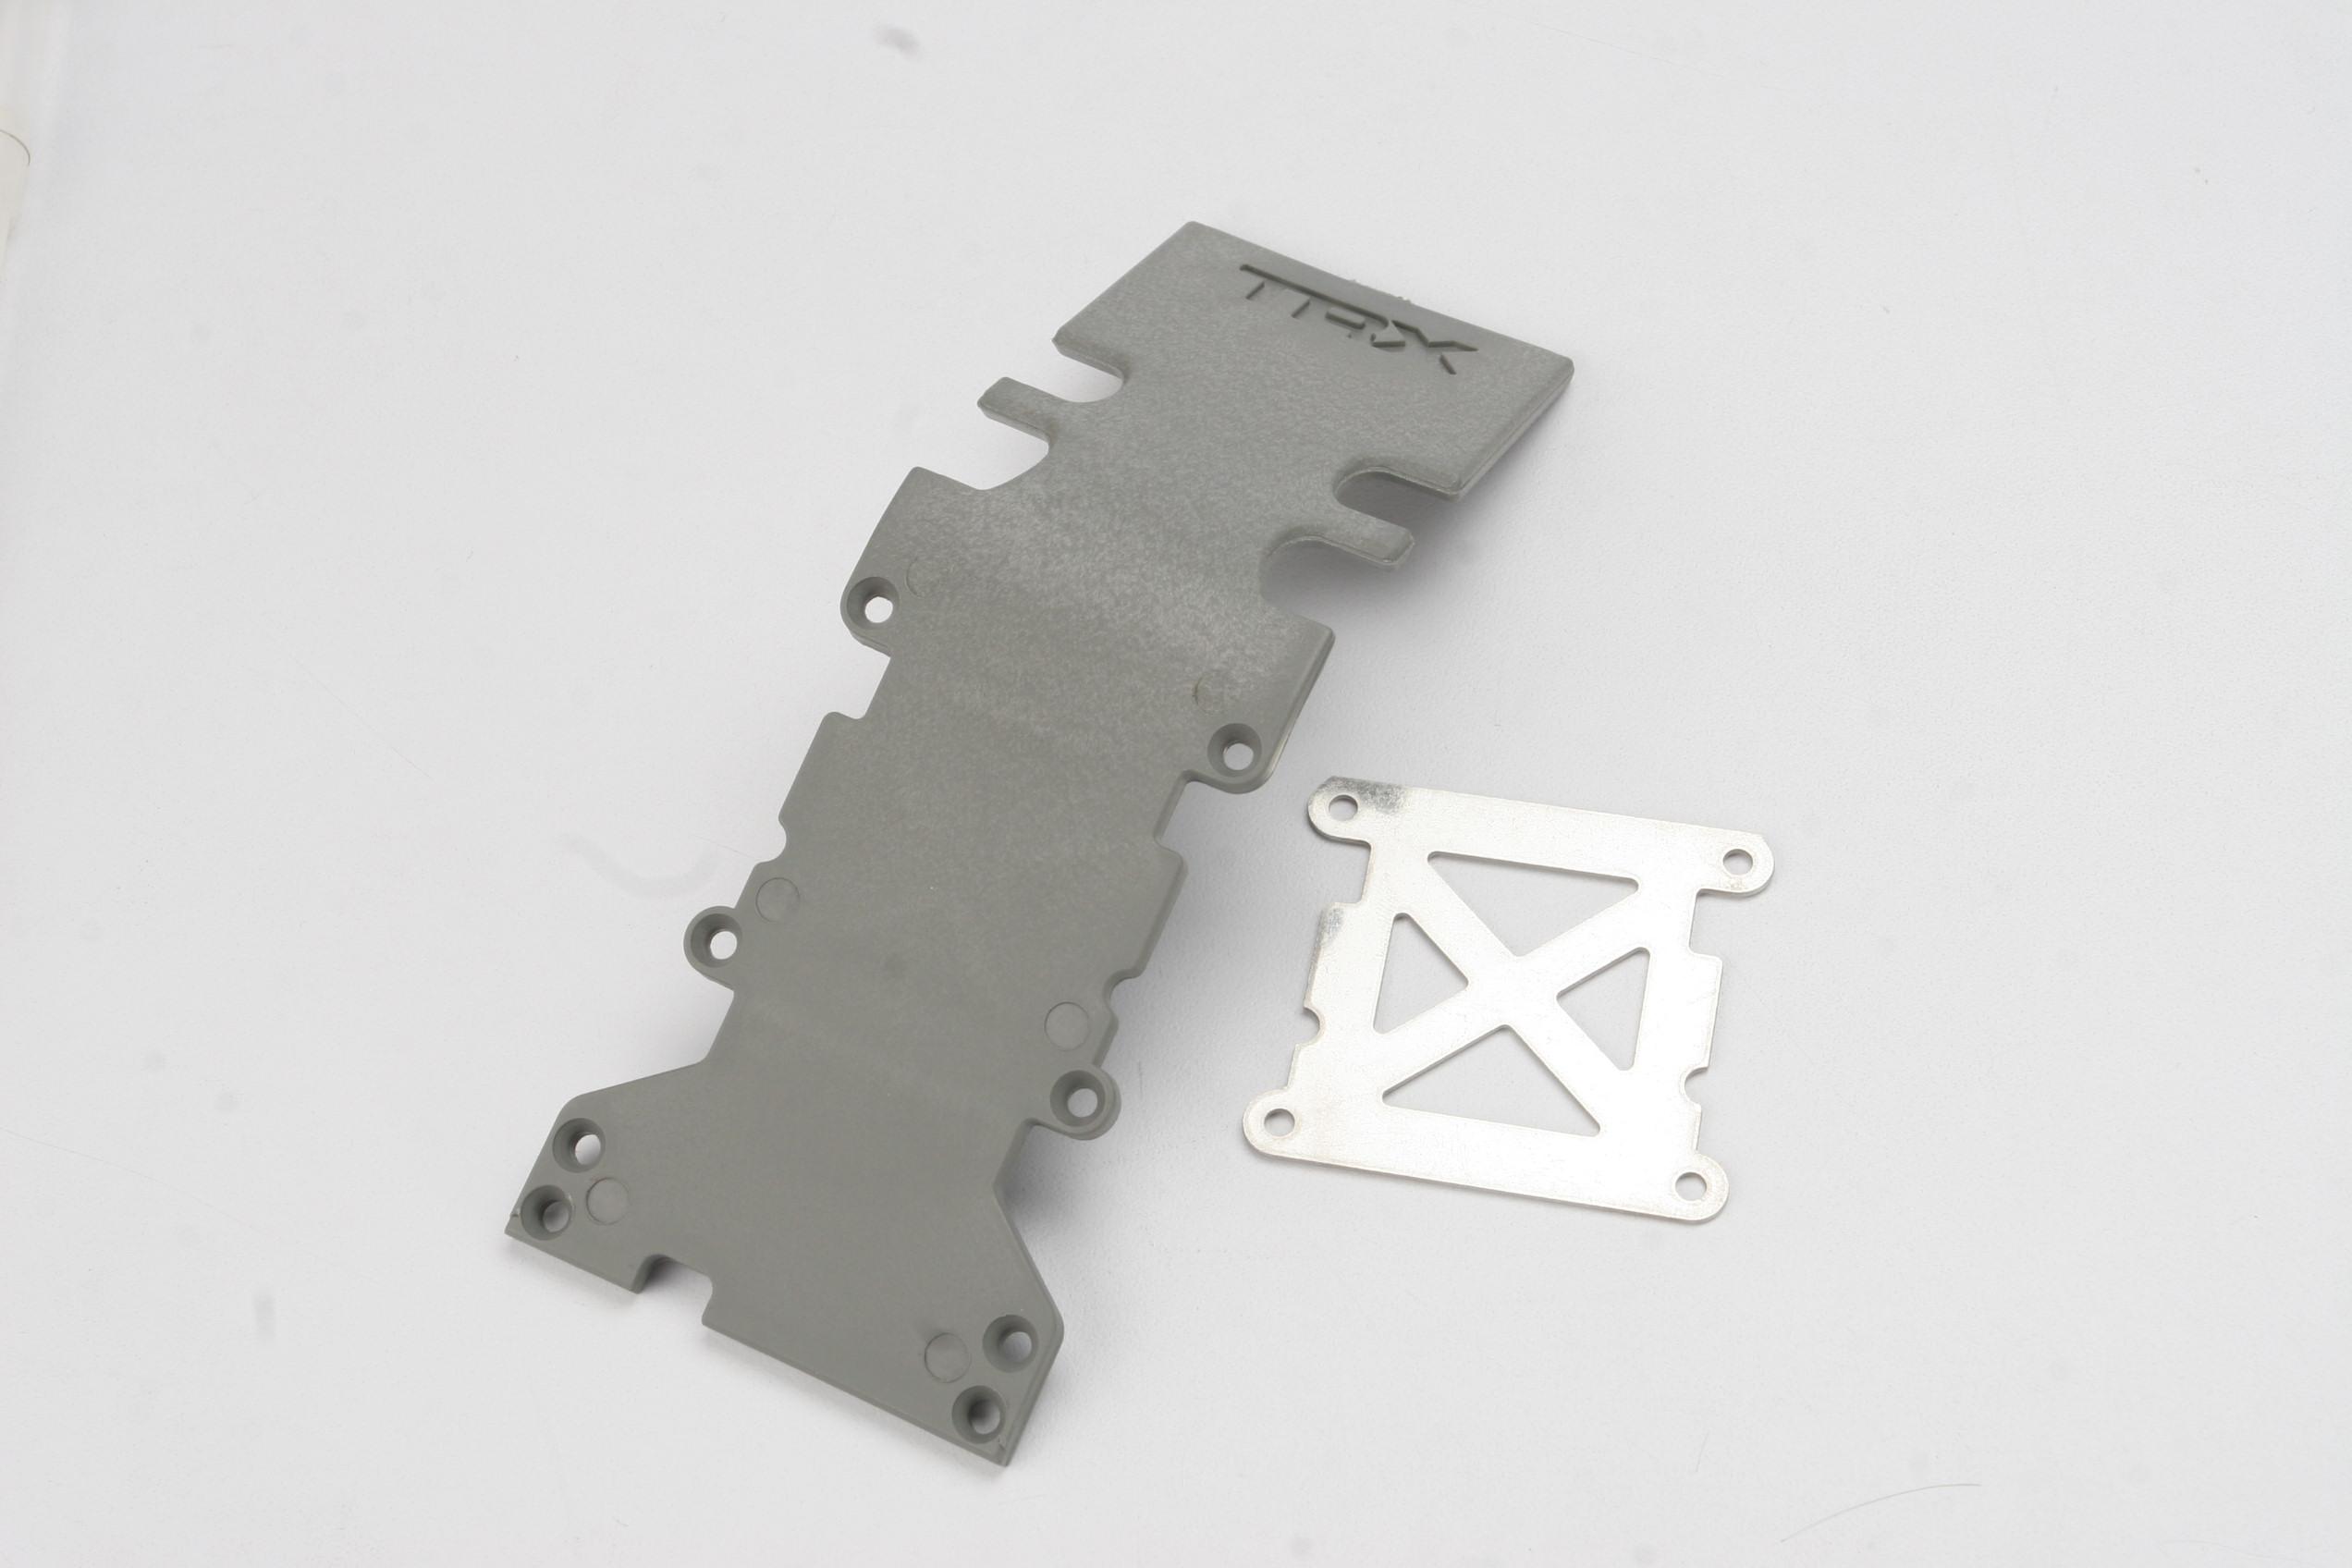 Skidplate, rear plastic (grey)/ stainless steel plate